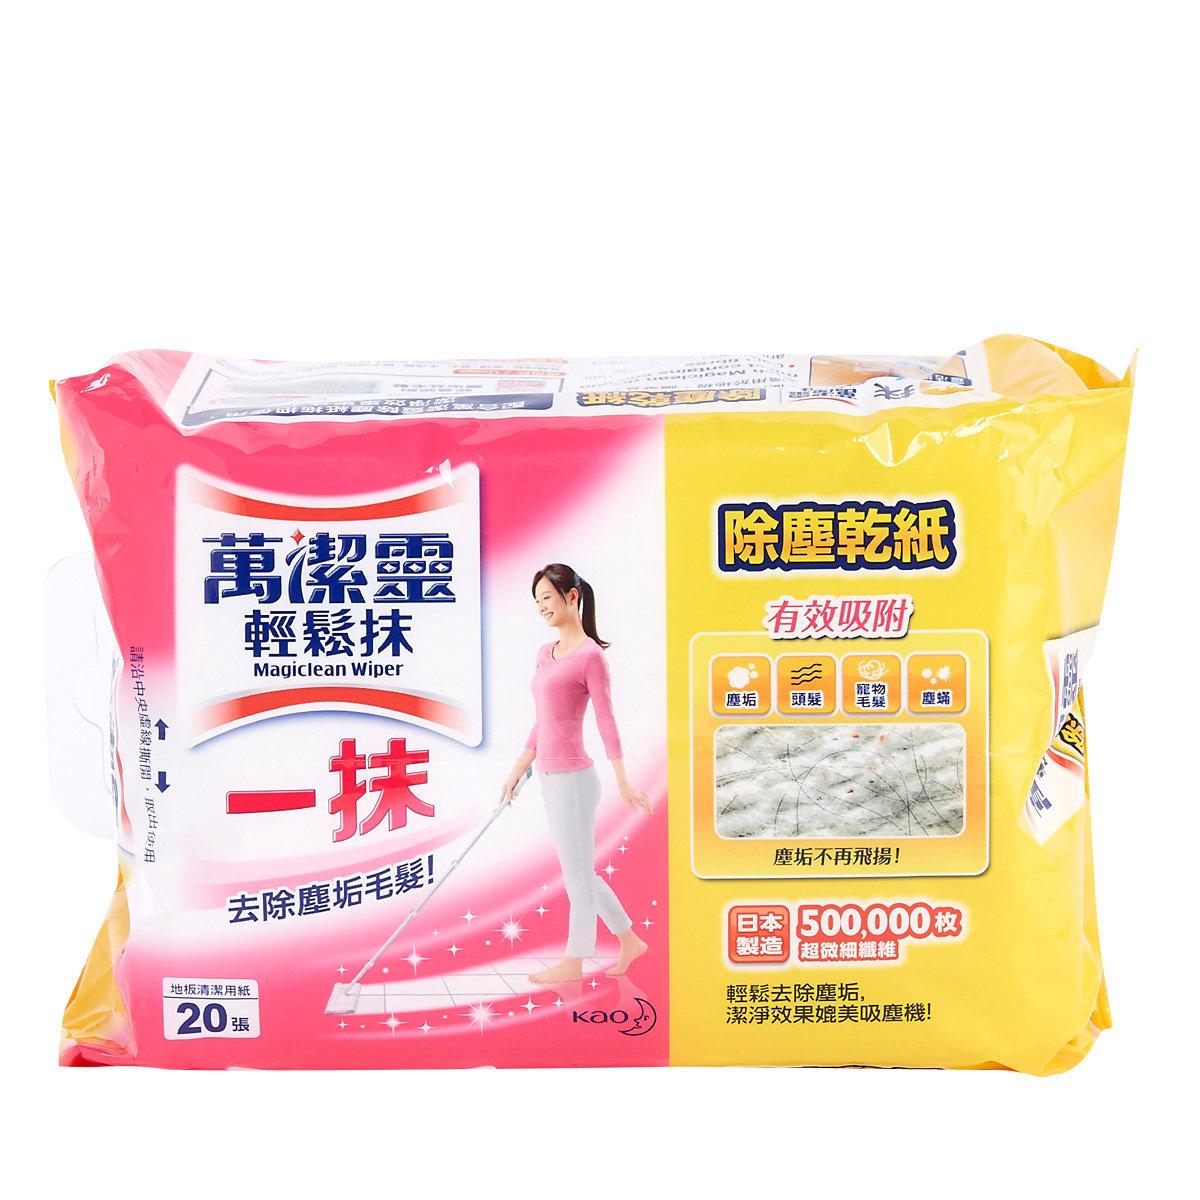 c9f822b6bef3 萬潔靈 | Wiper Dry Sheet | HKTVmall Online Shopping